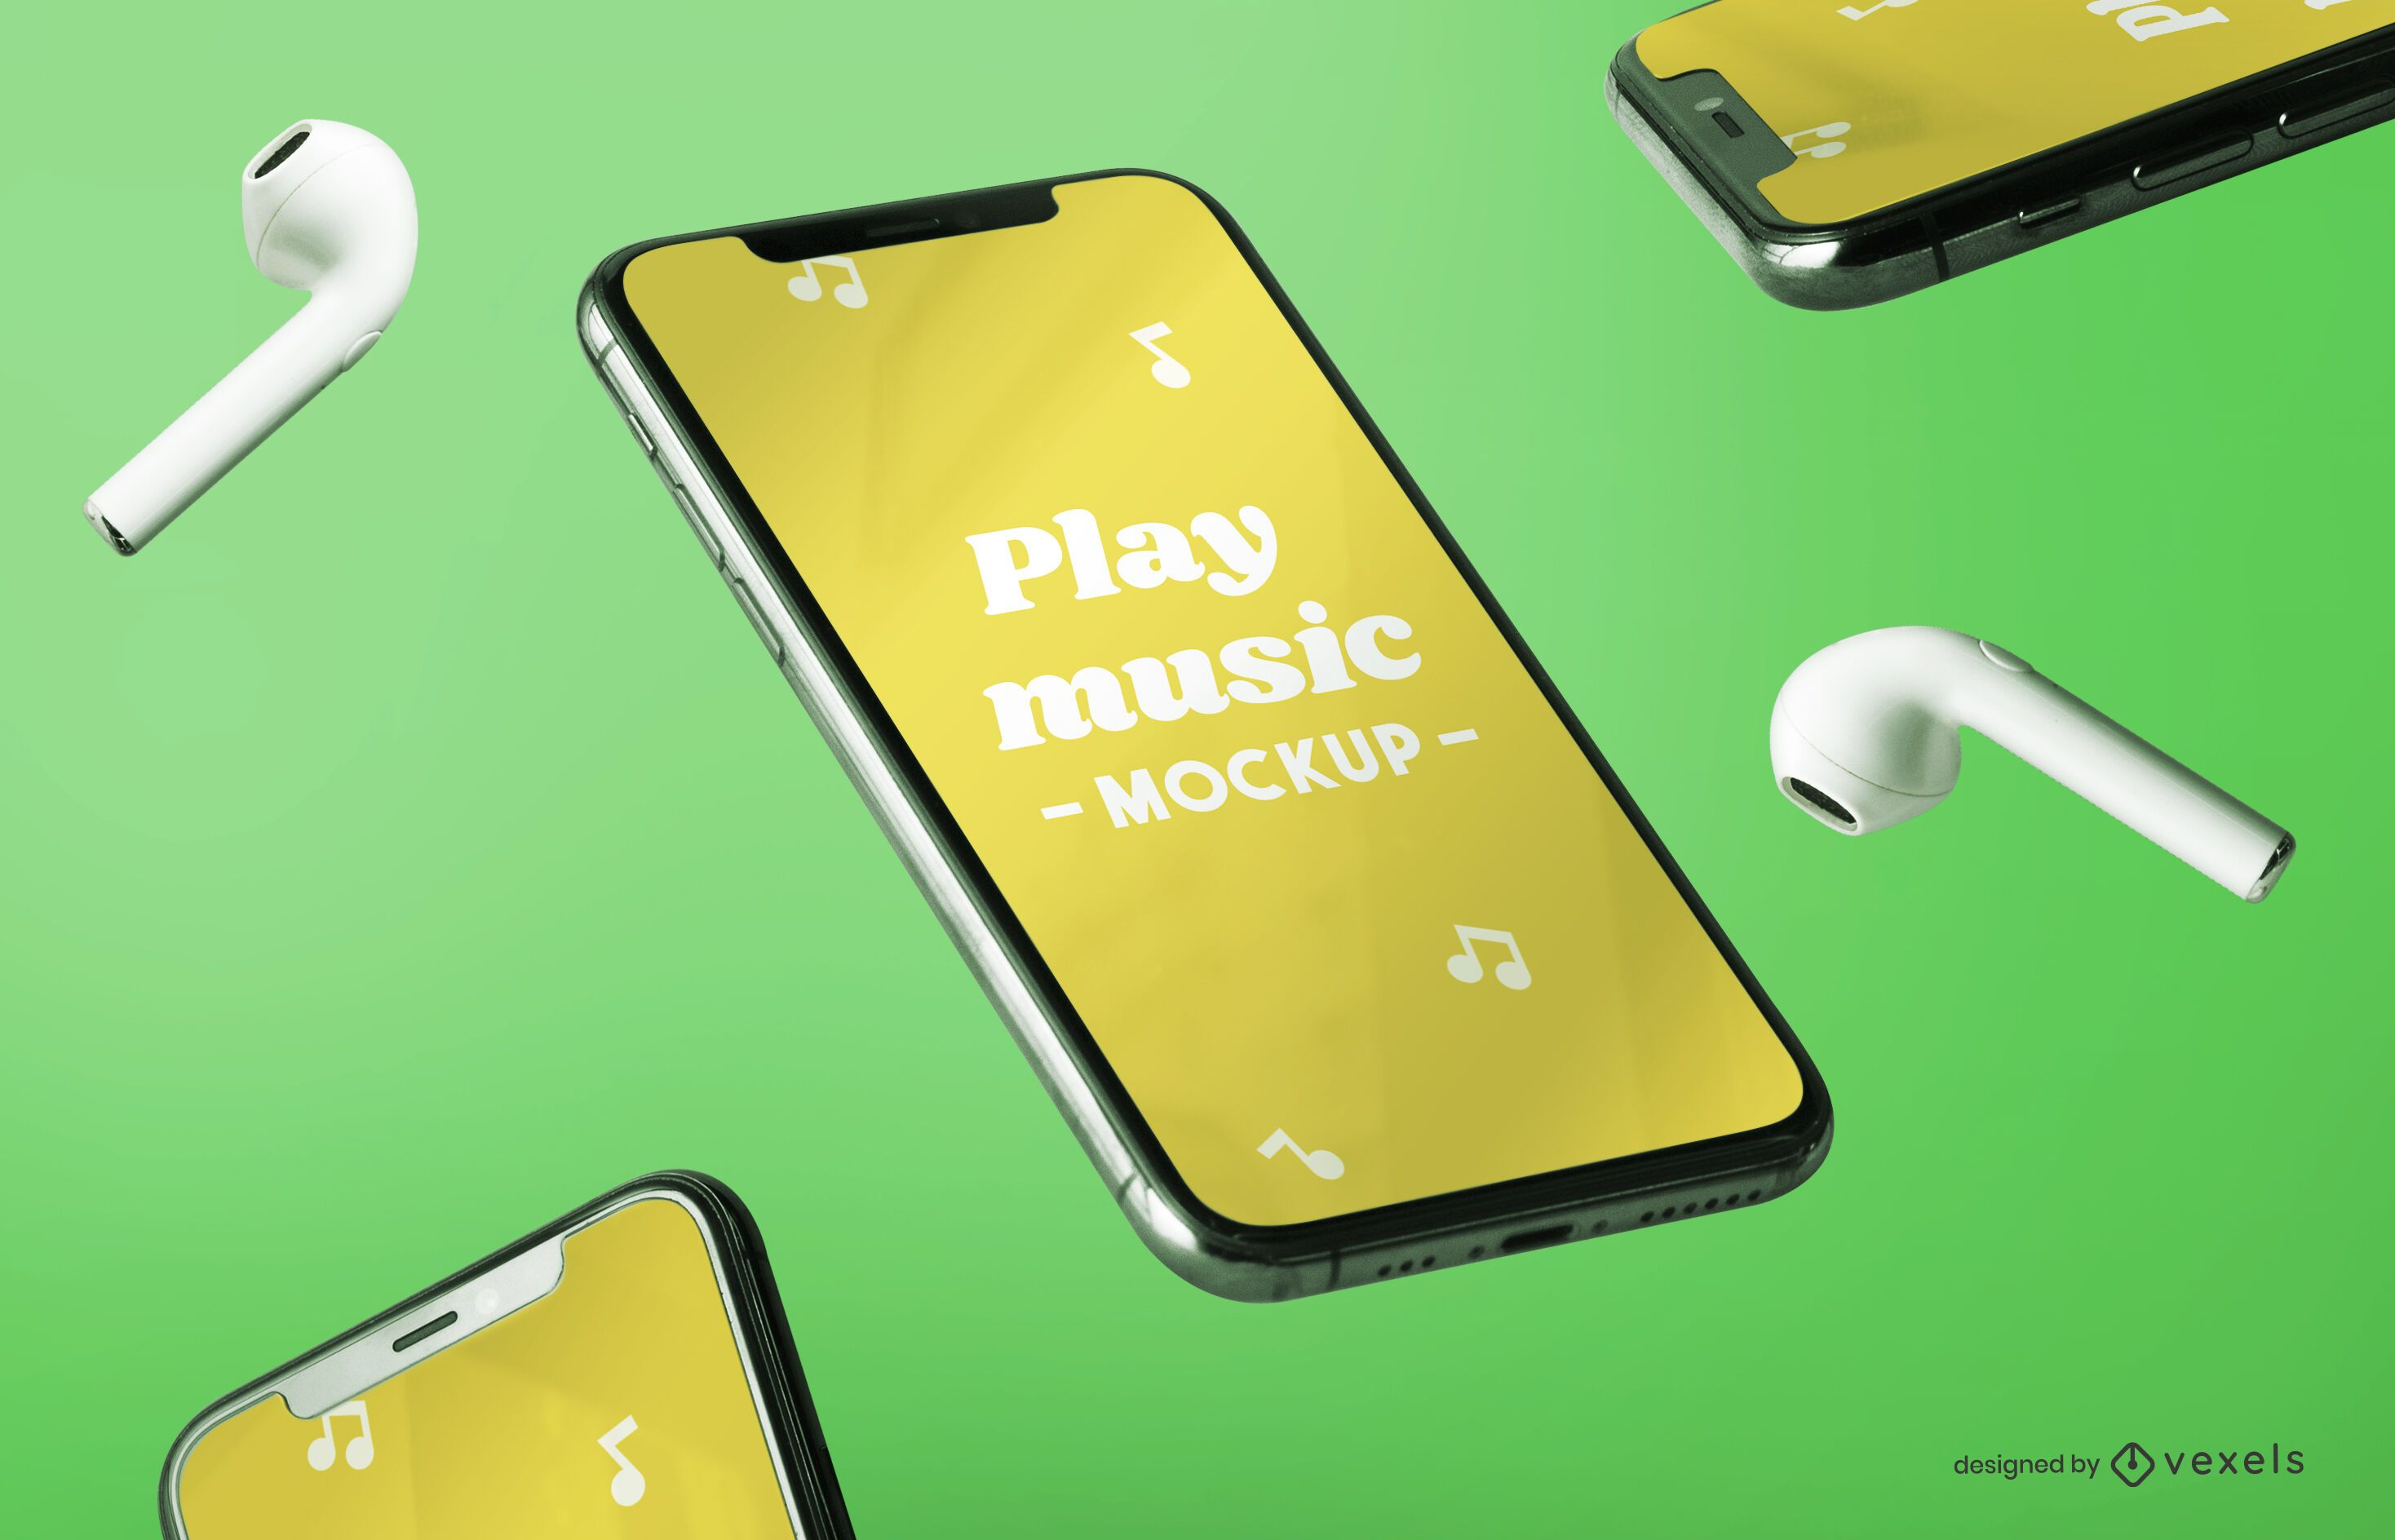 Iphone Musik Modell Komposition